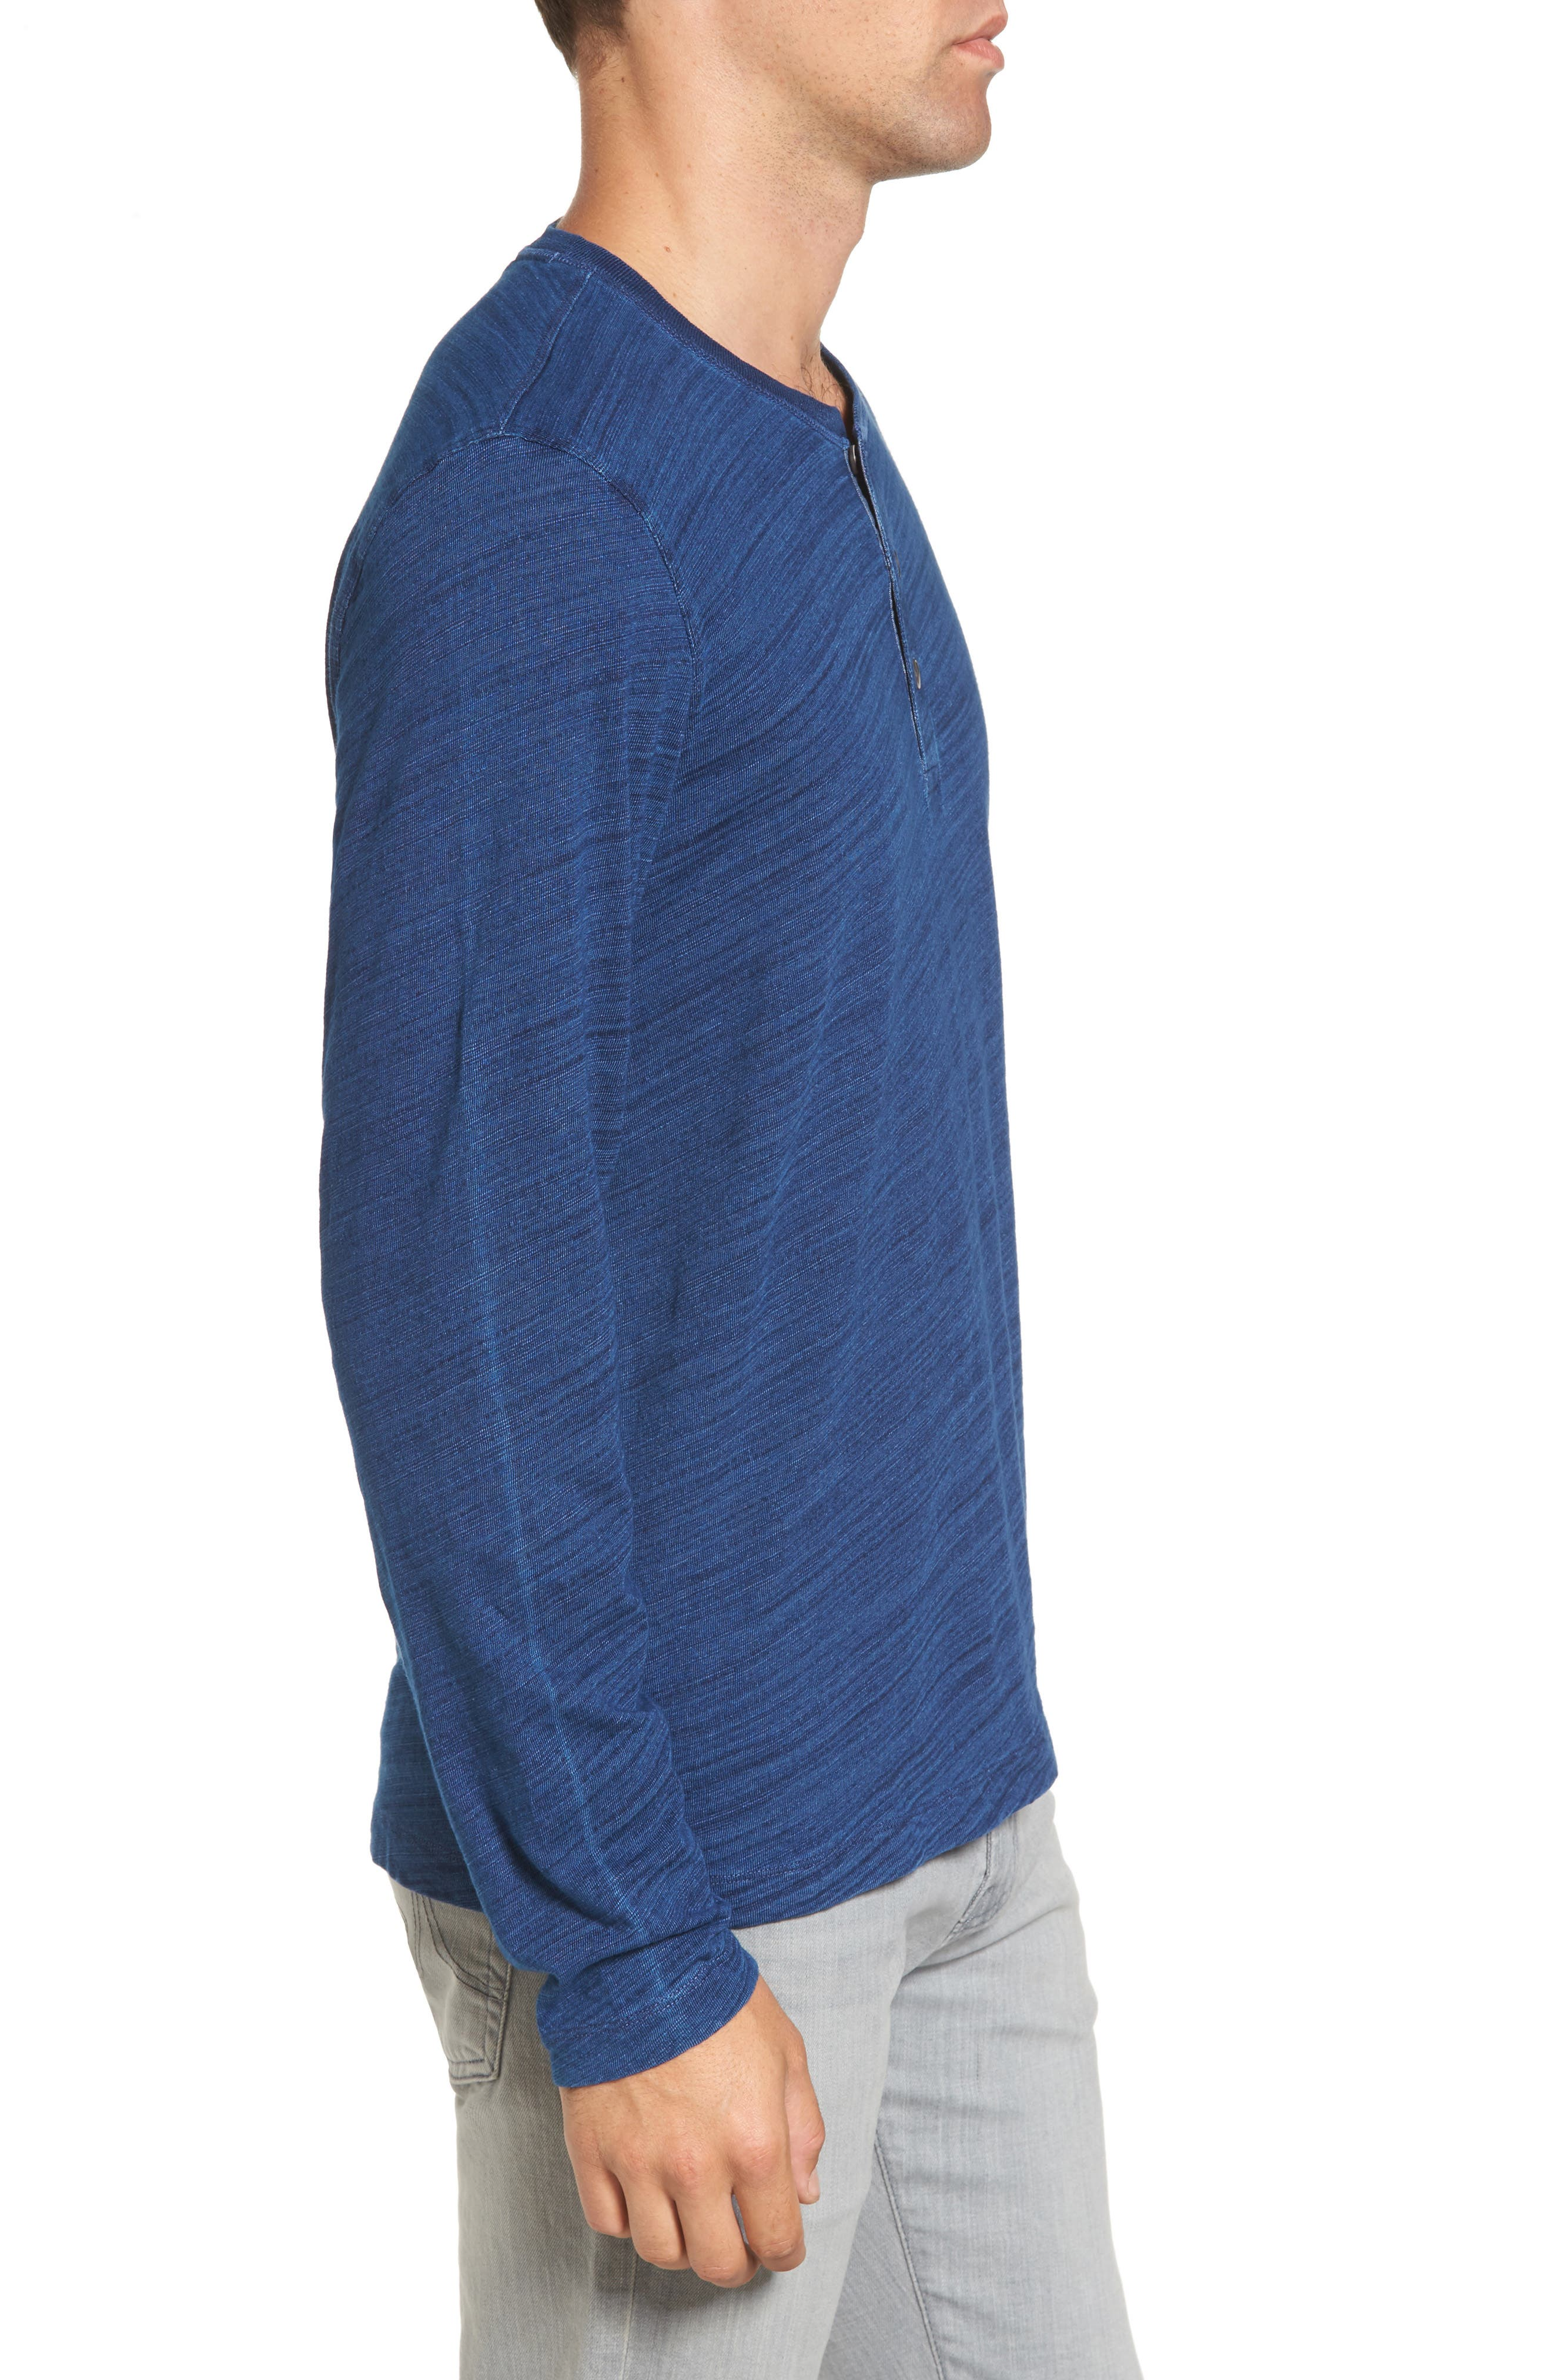 Alternate Image 3  - Tailor Vintage Slub Jersey Henley